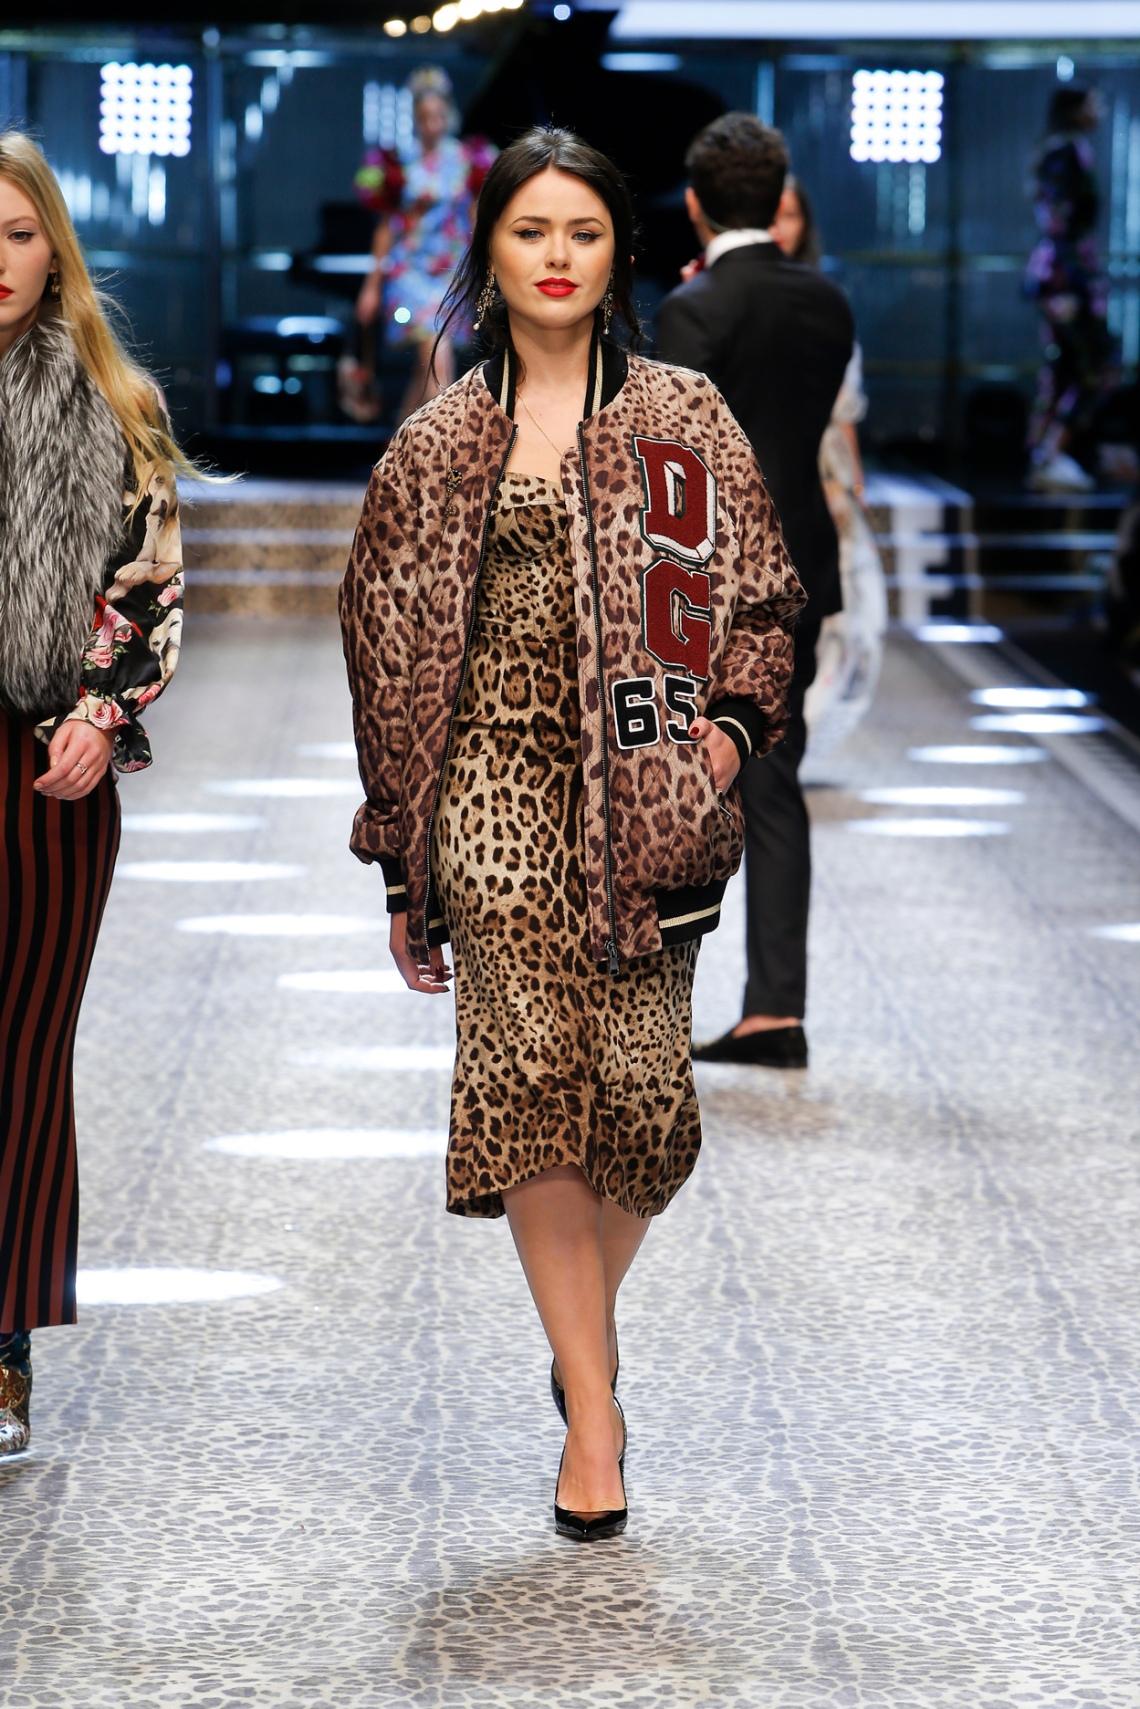 dolce-and-gabbana-fall-winter-2017-18-women-fashion-show-runway-62